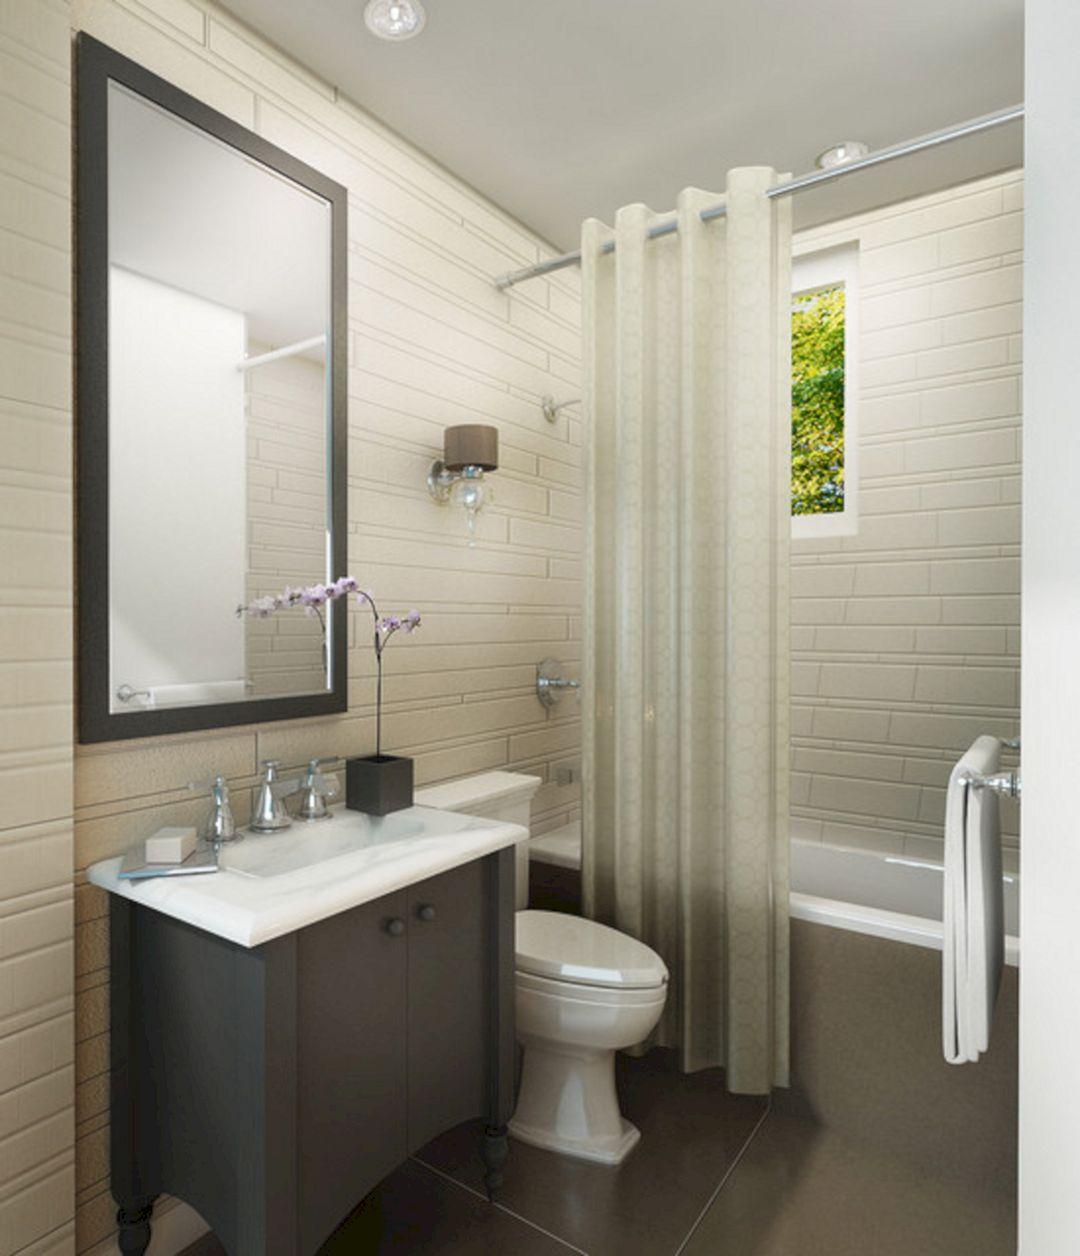 Small Full Bathroom Remodel Ideas 16